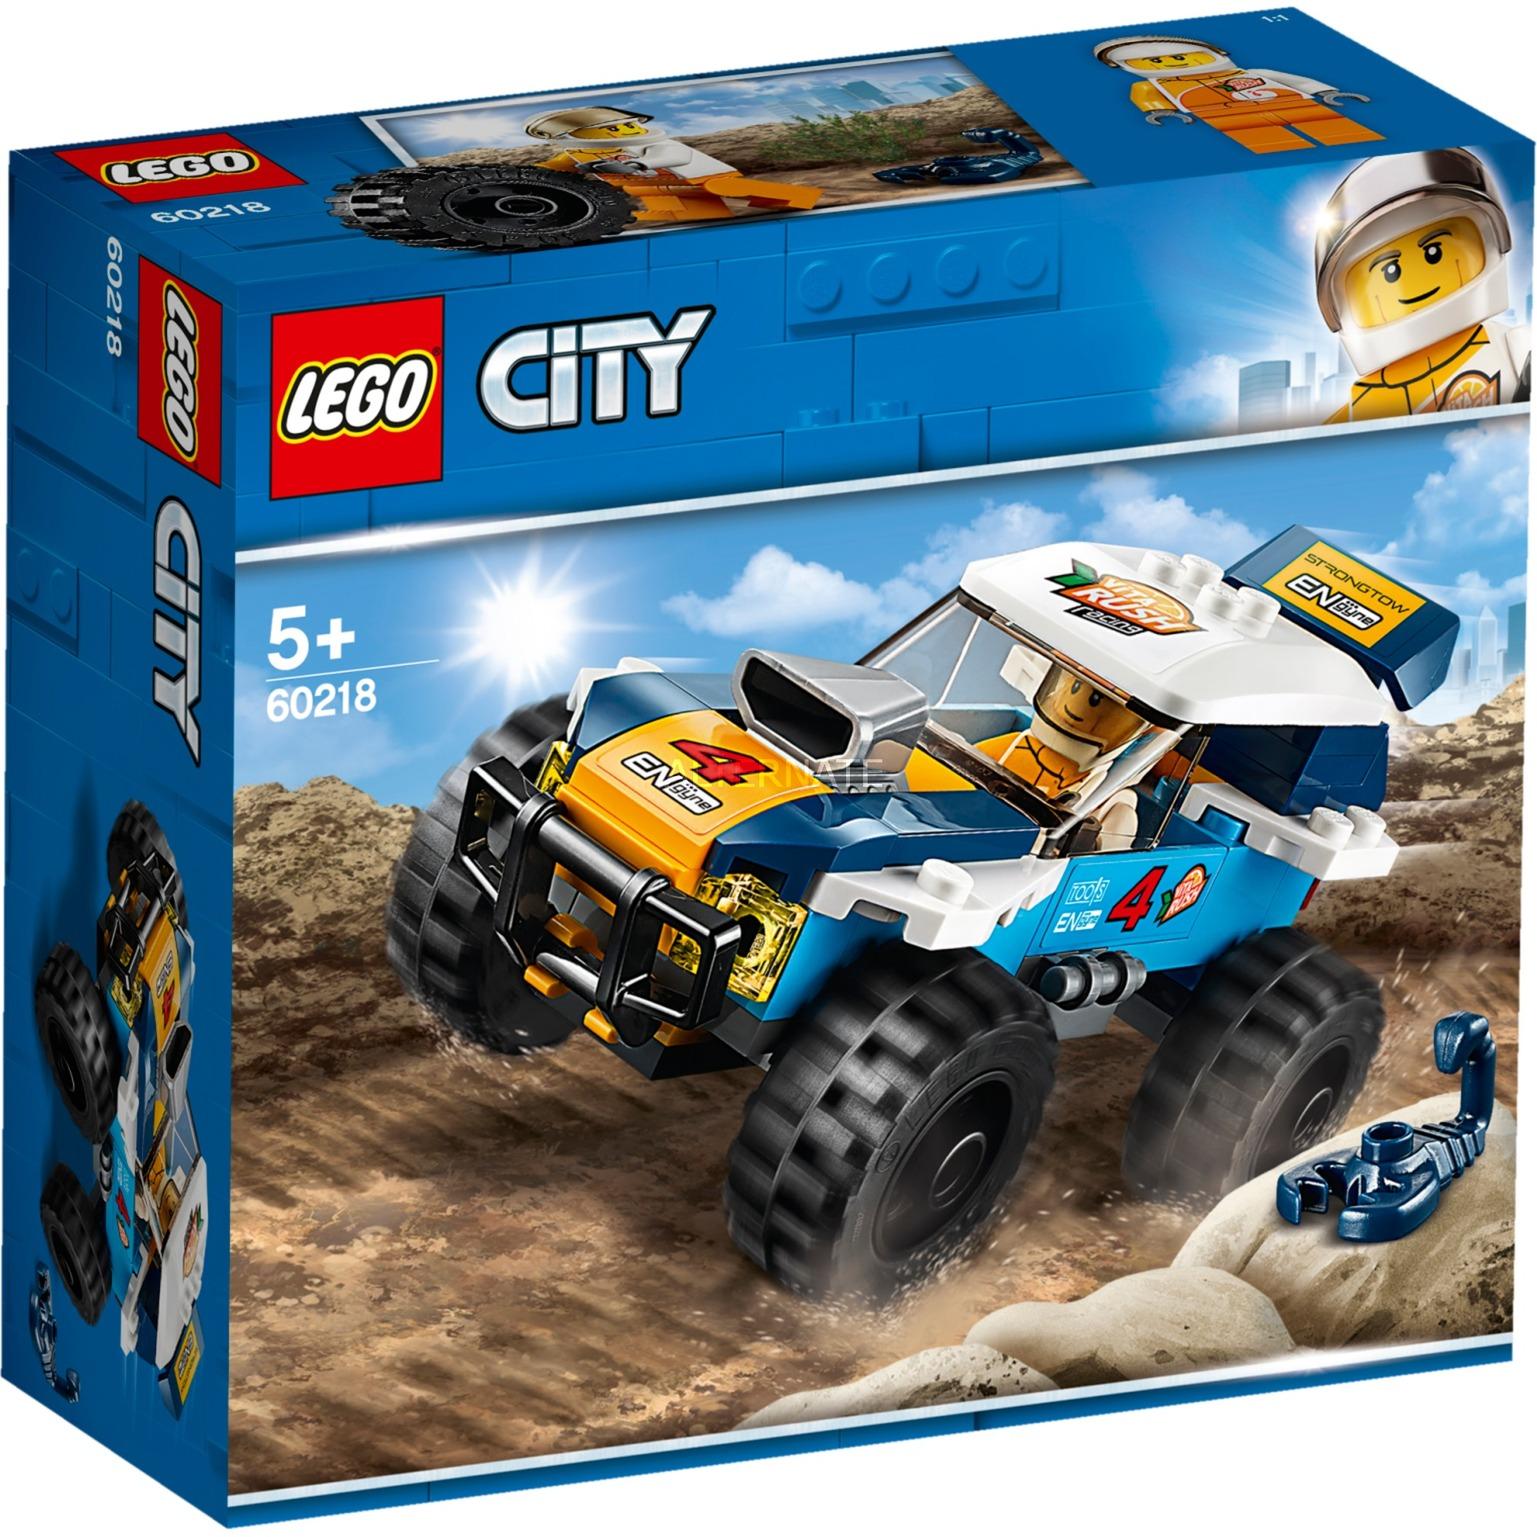 LEGO City - Coche de Rally del Desierto - 60218